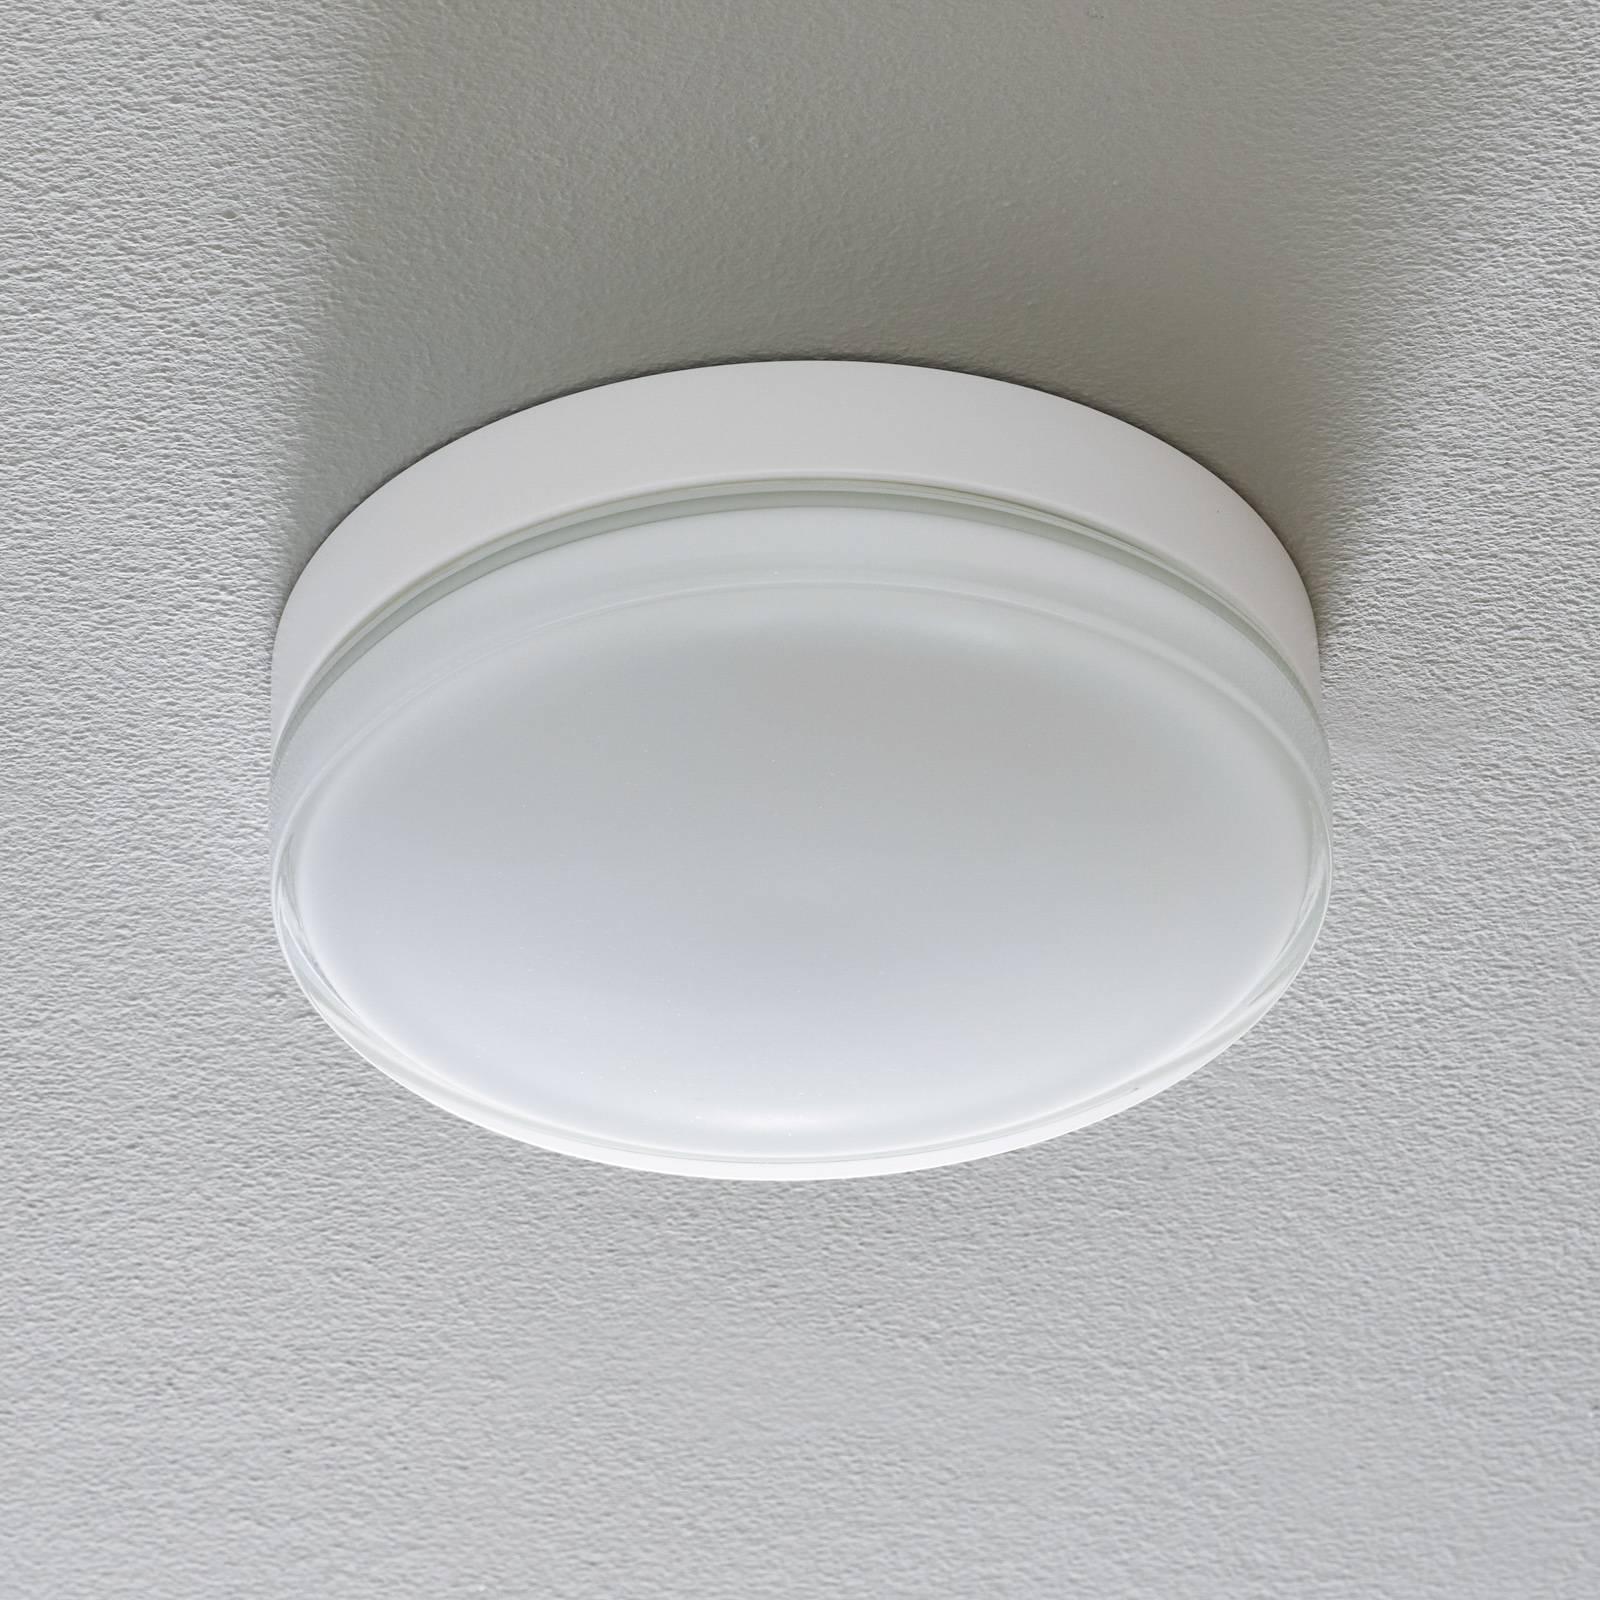 BEGA 12128 LED-kattovalaisin 930 valkoinen 26cm